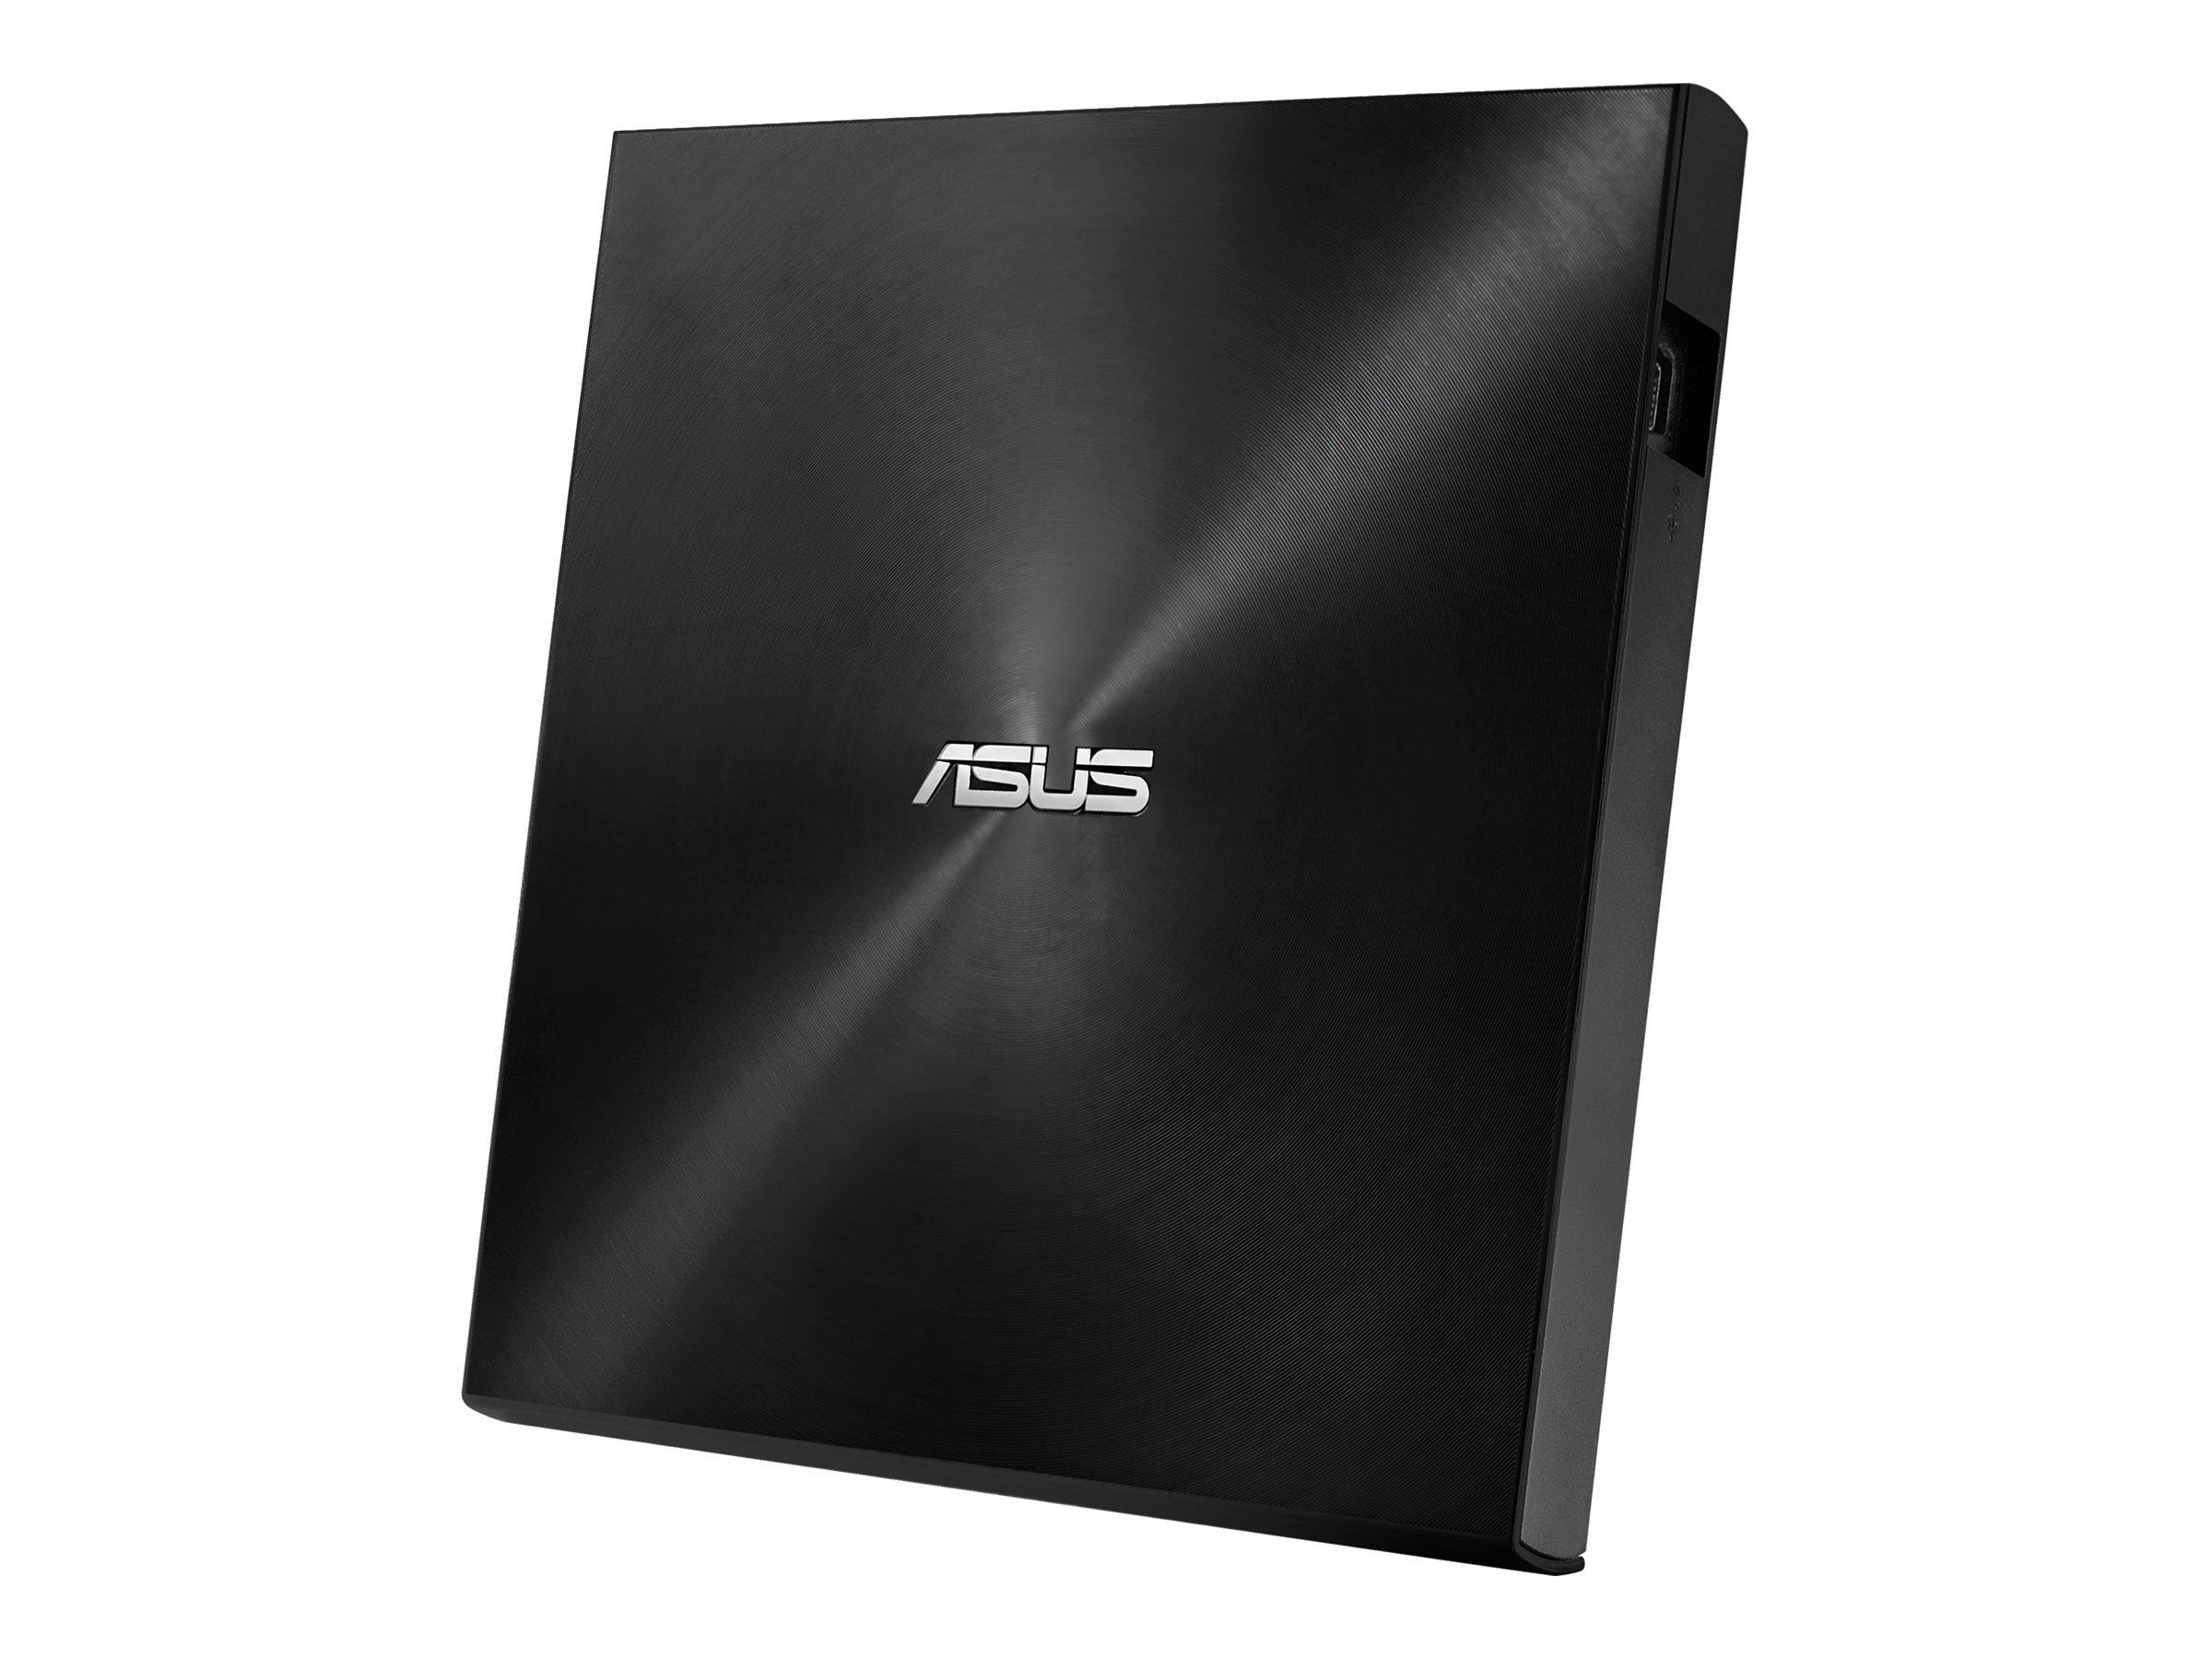 ASUS ZenDrive U7M SDRW-08U7M-U Laufwerk - DVD±RW (±R DL) / DVD-RAM - 8x/8x/5x - USB 2.0 - extern - Schwarz